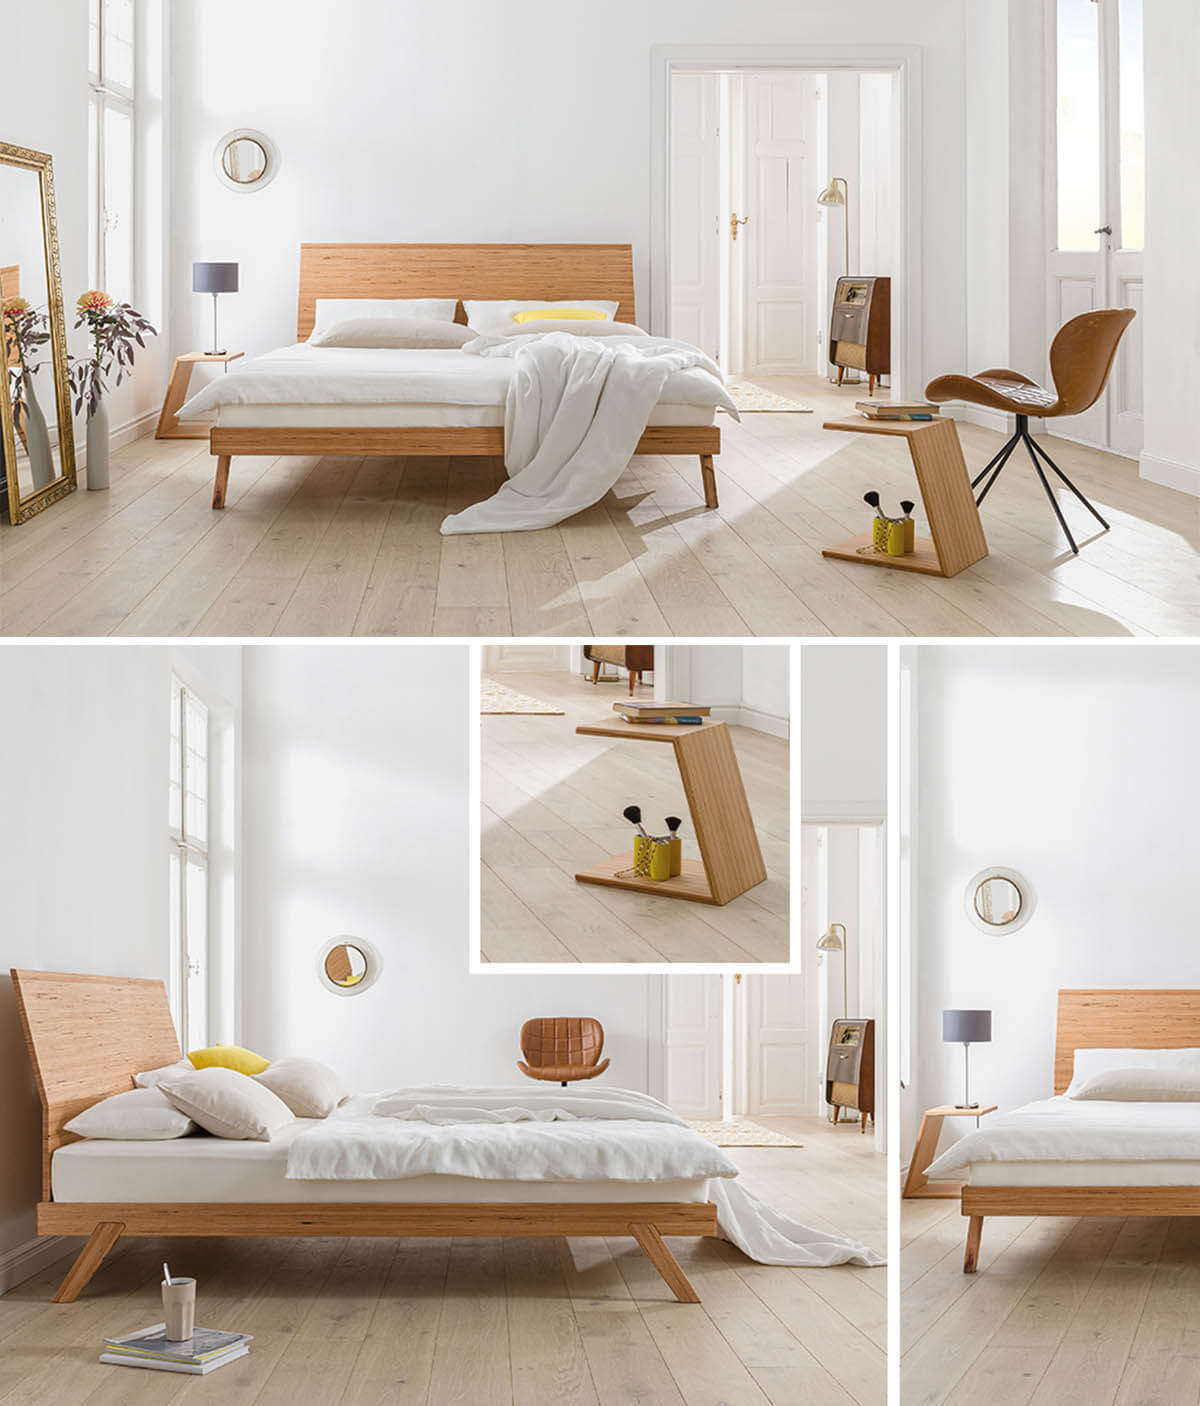 Dormiente-Massivholzbett-Laria-Betten-aus-Massivholz-kaufen